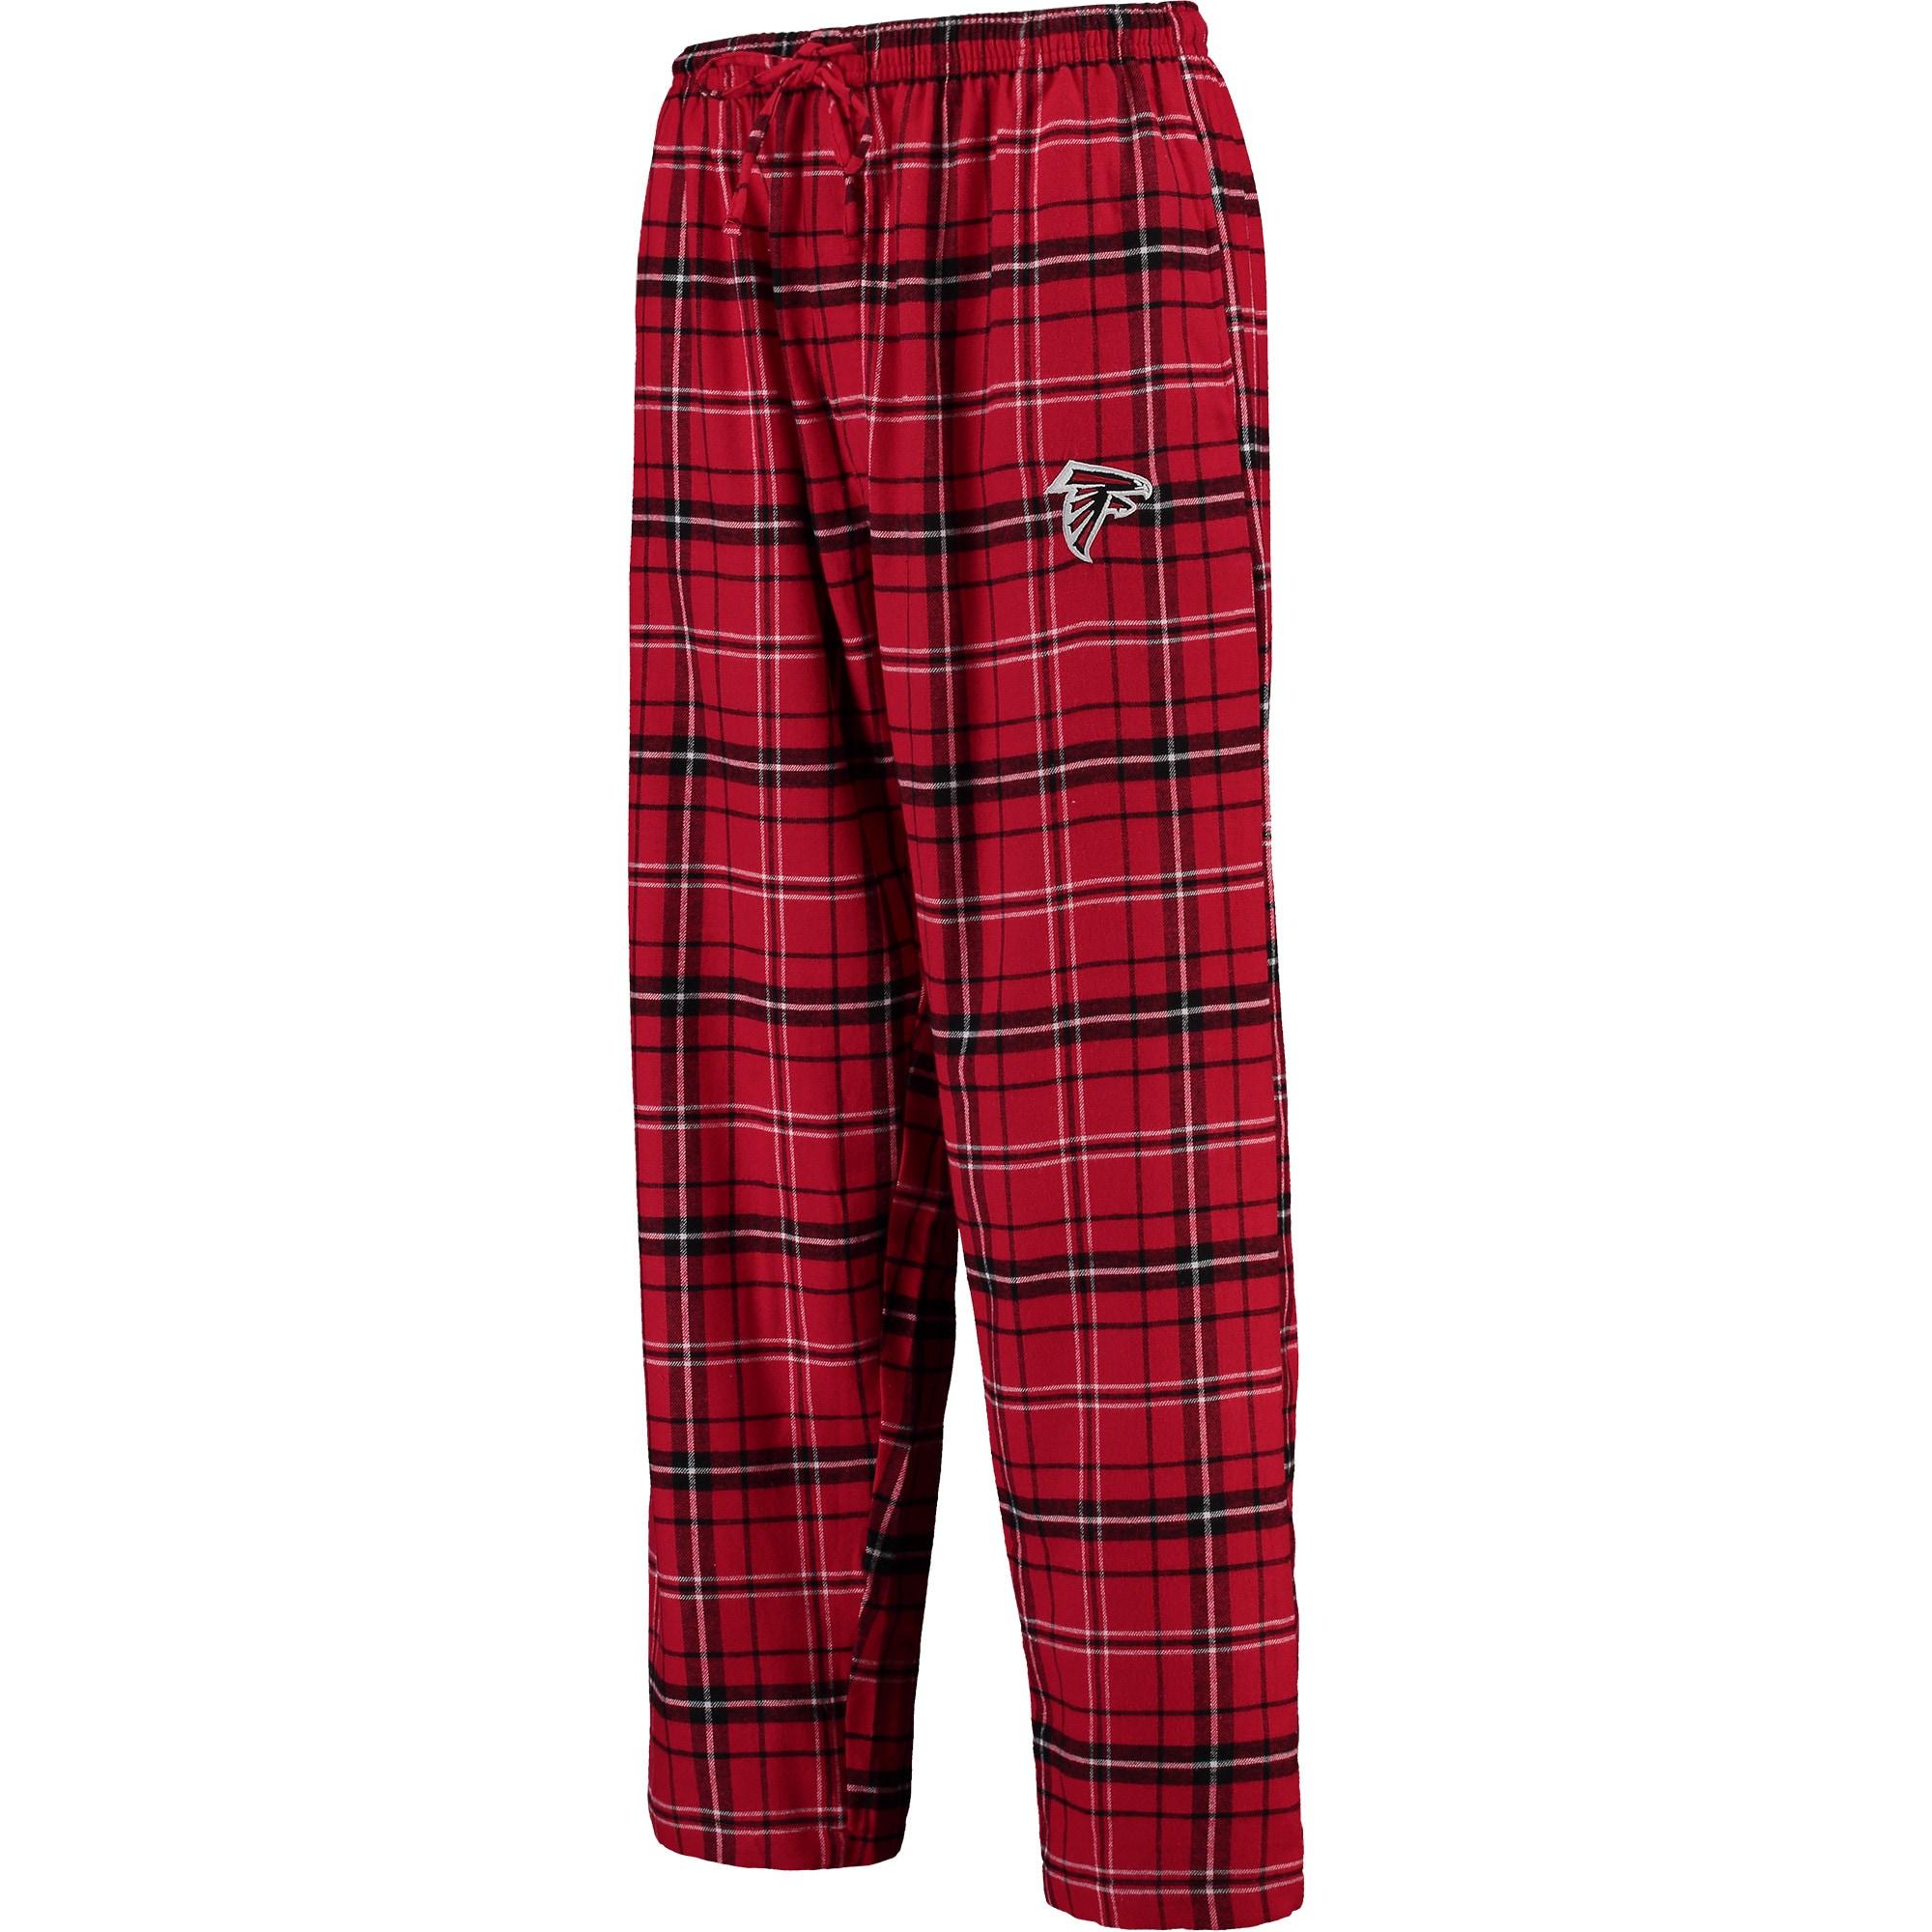 Atlanta Falcons Concepts Sport Men's Ultimate Plaid Flannel Pants - Red/Black